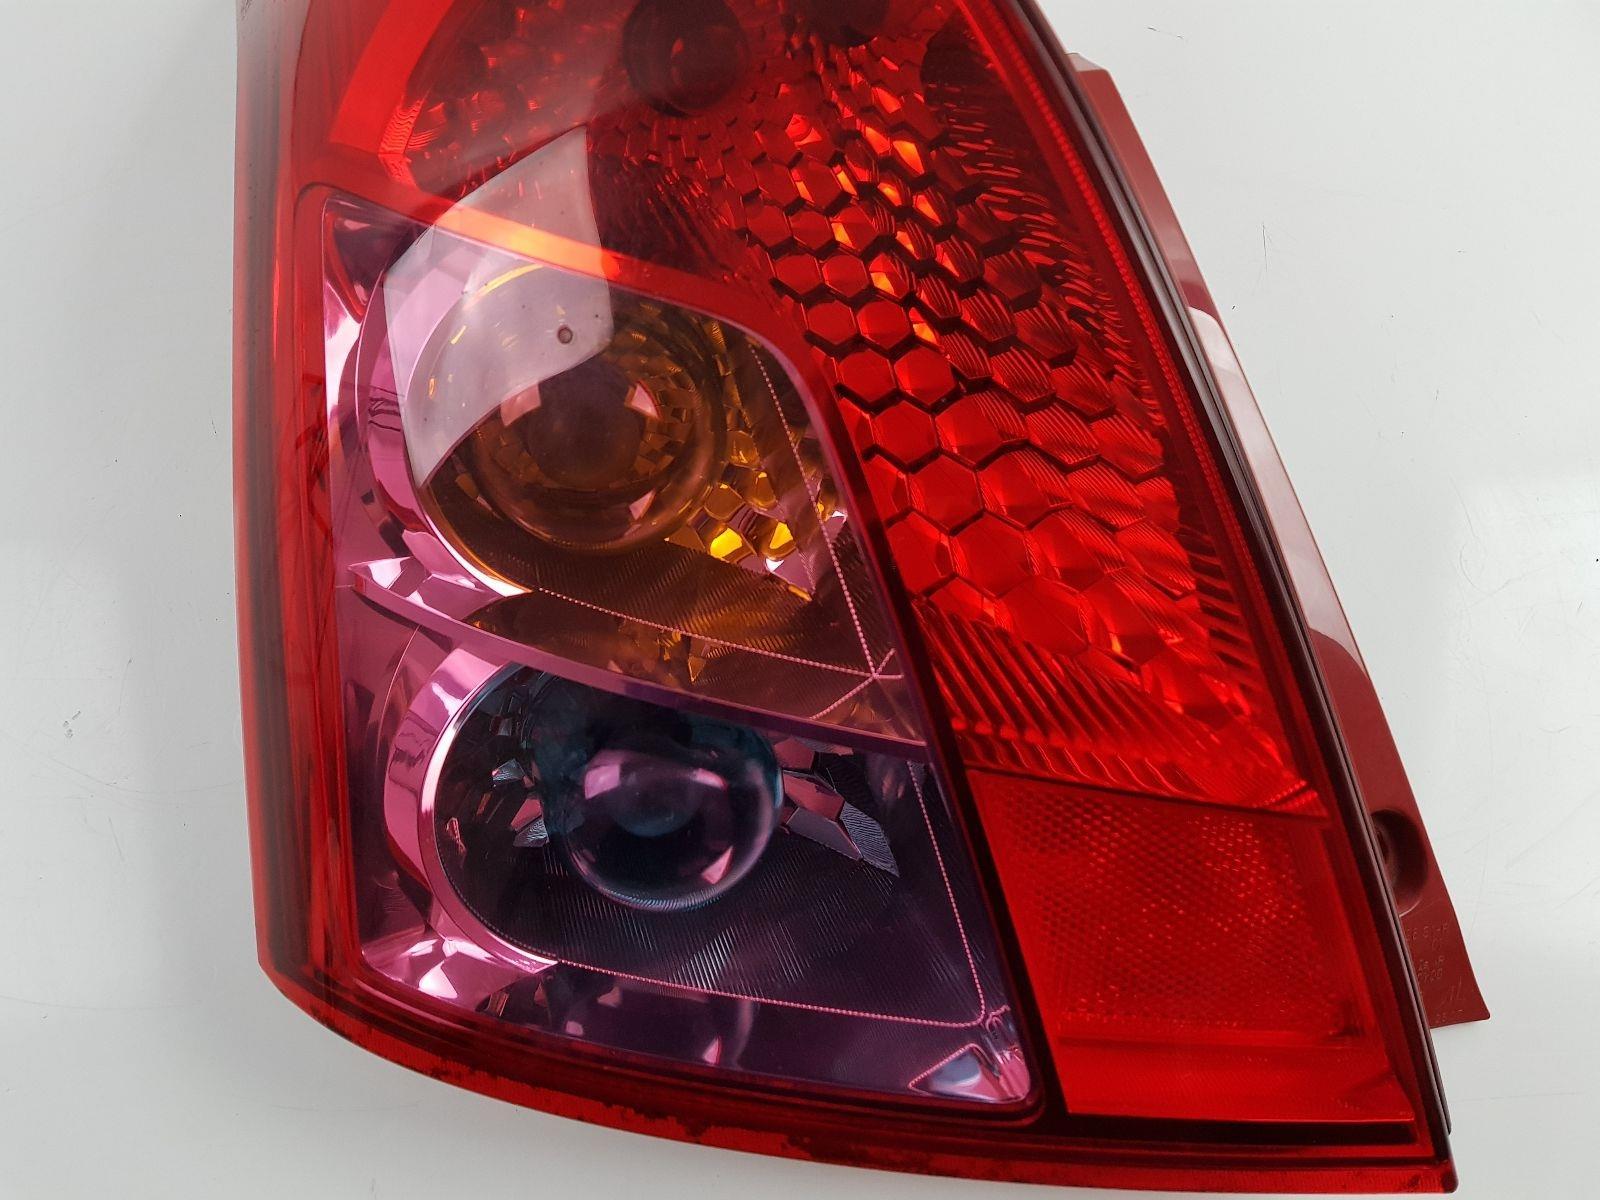 Suzuki Swift 2005 To 2010 Lamp Assembly Rear LH (Petrol